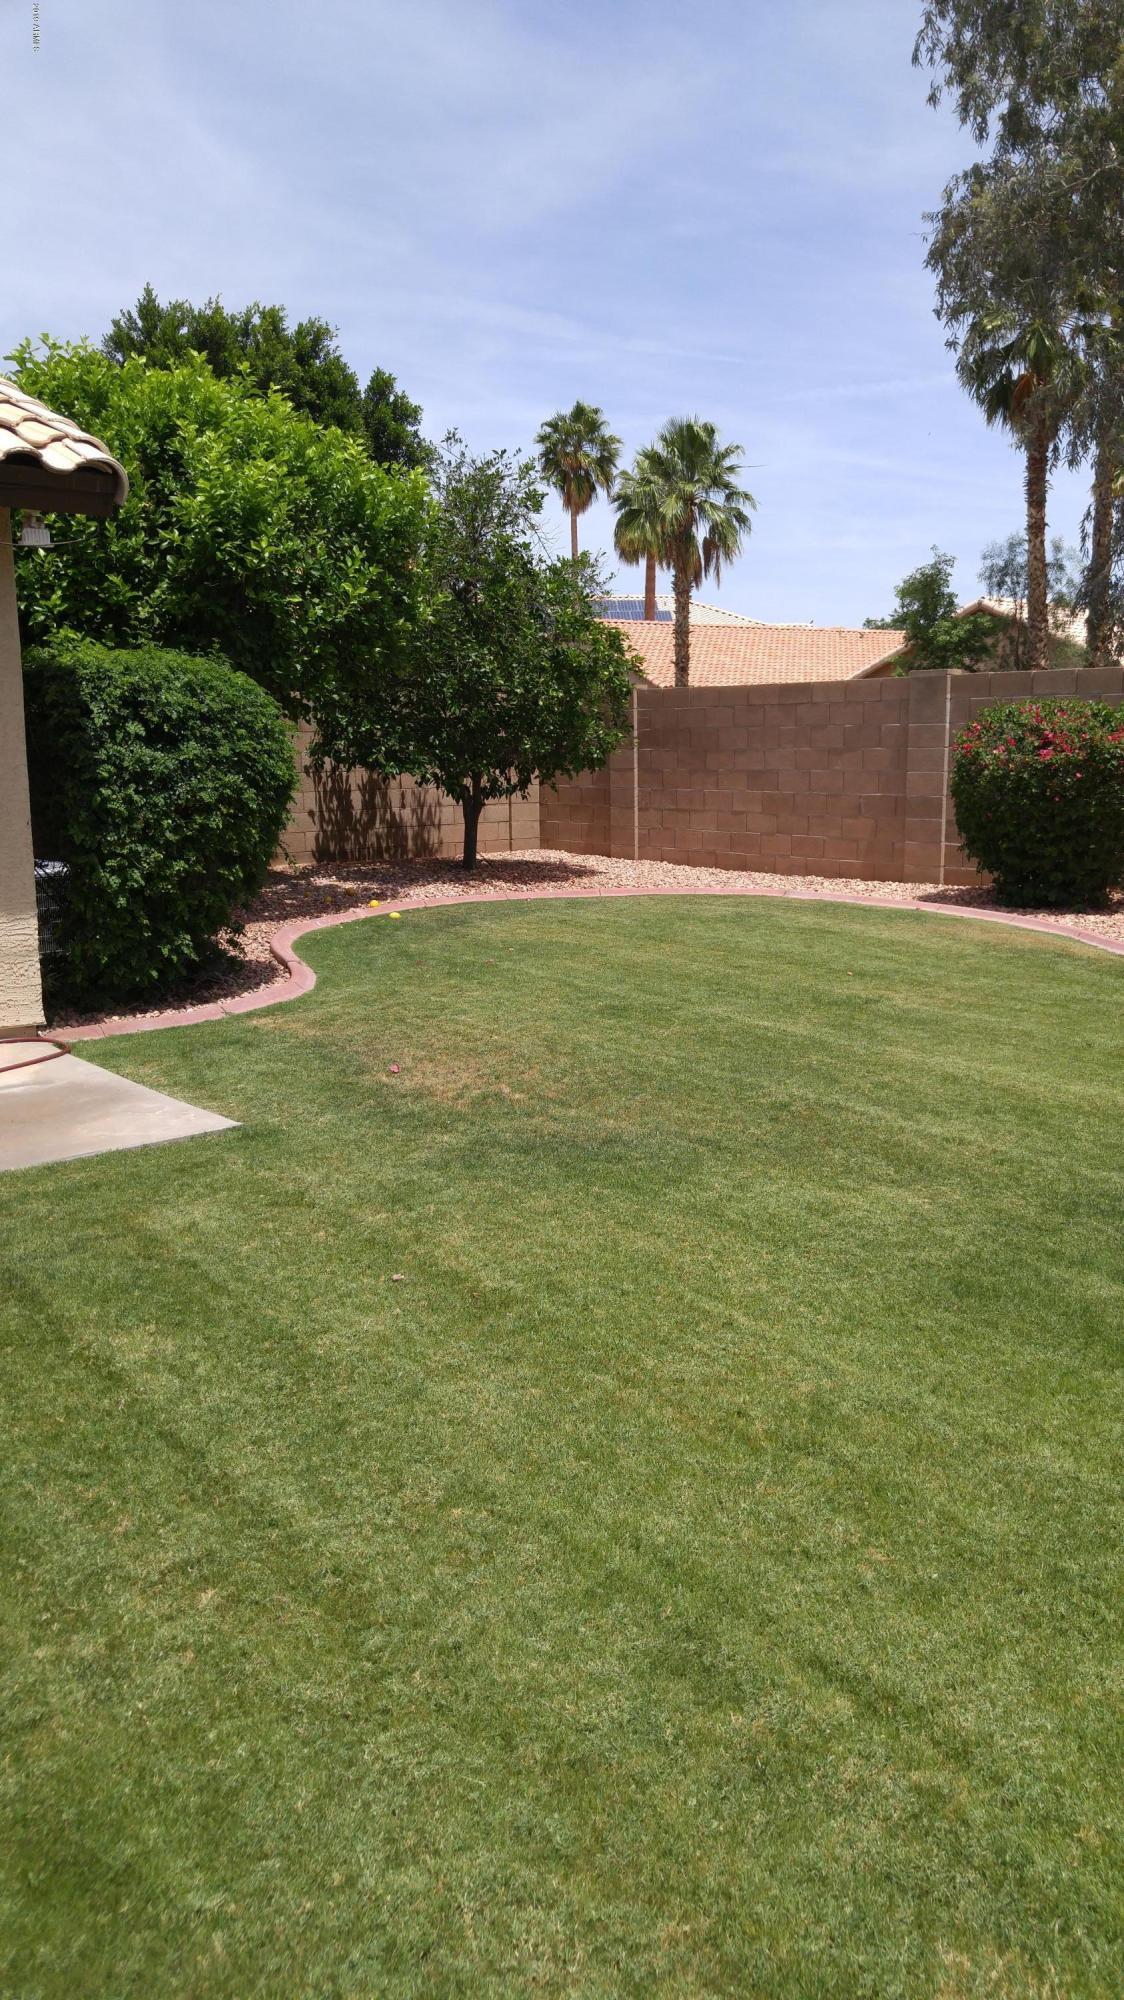 MLS 5921774 2421 N 127TH Avenue, Avondale, AZ 85392 Avondale AZ Four Bedroom